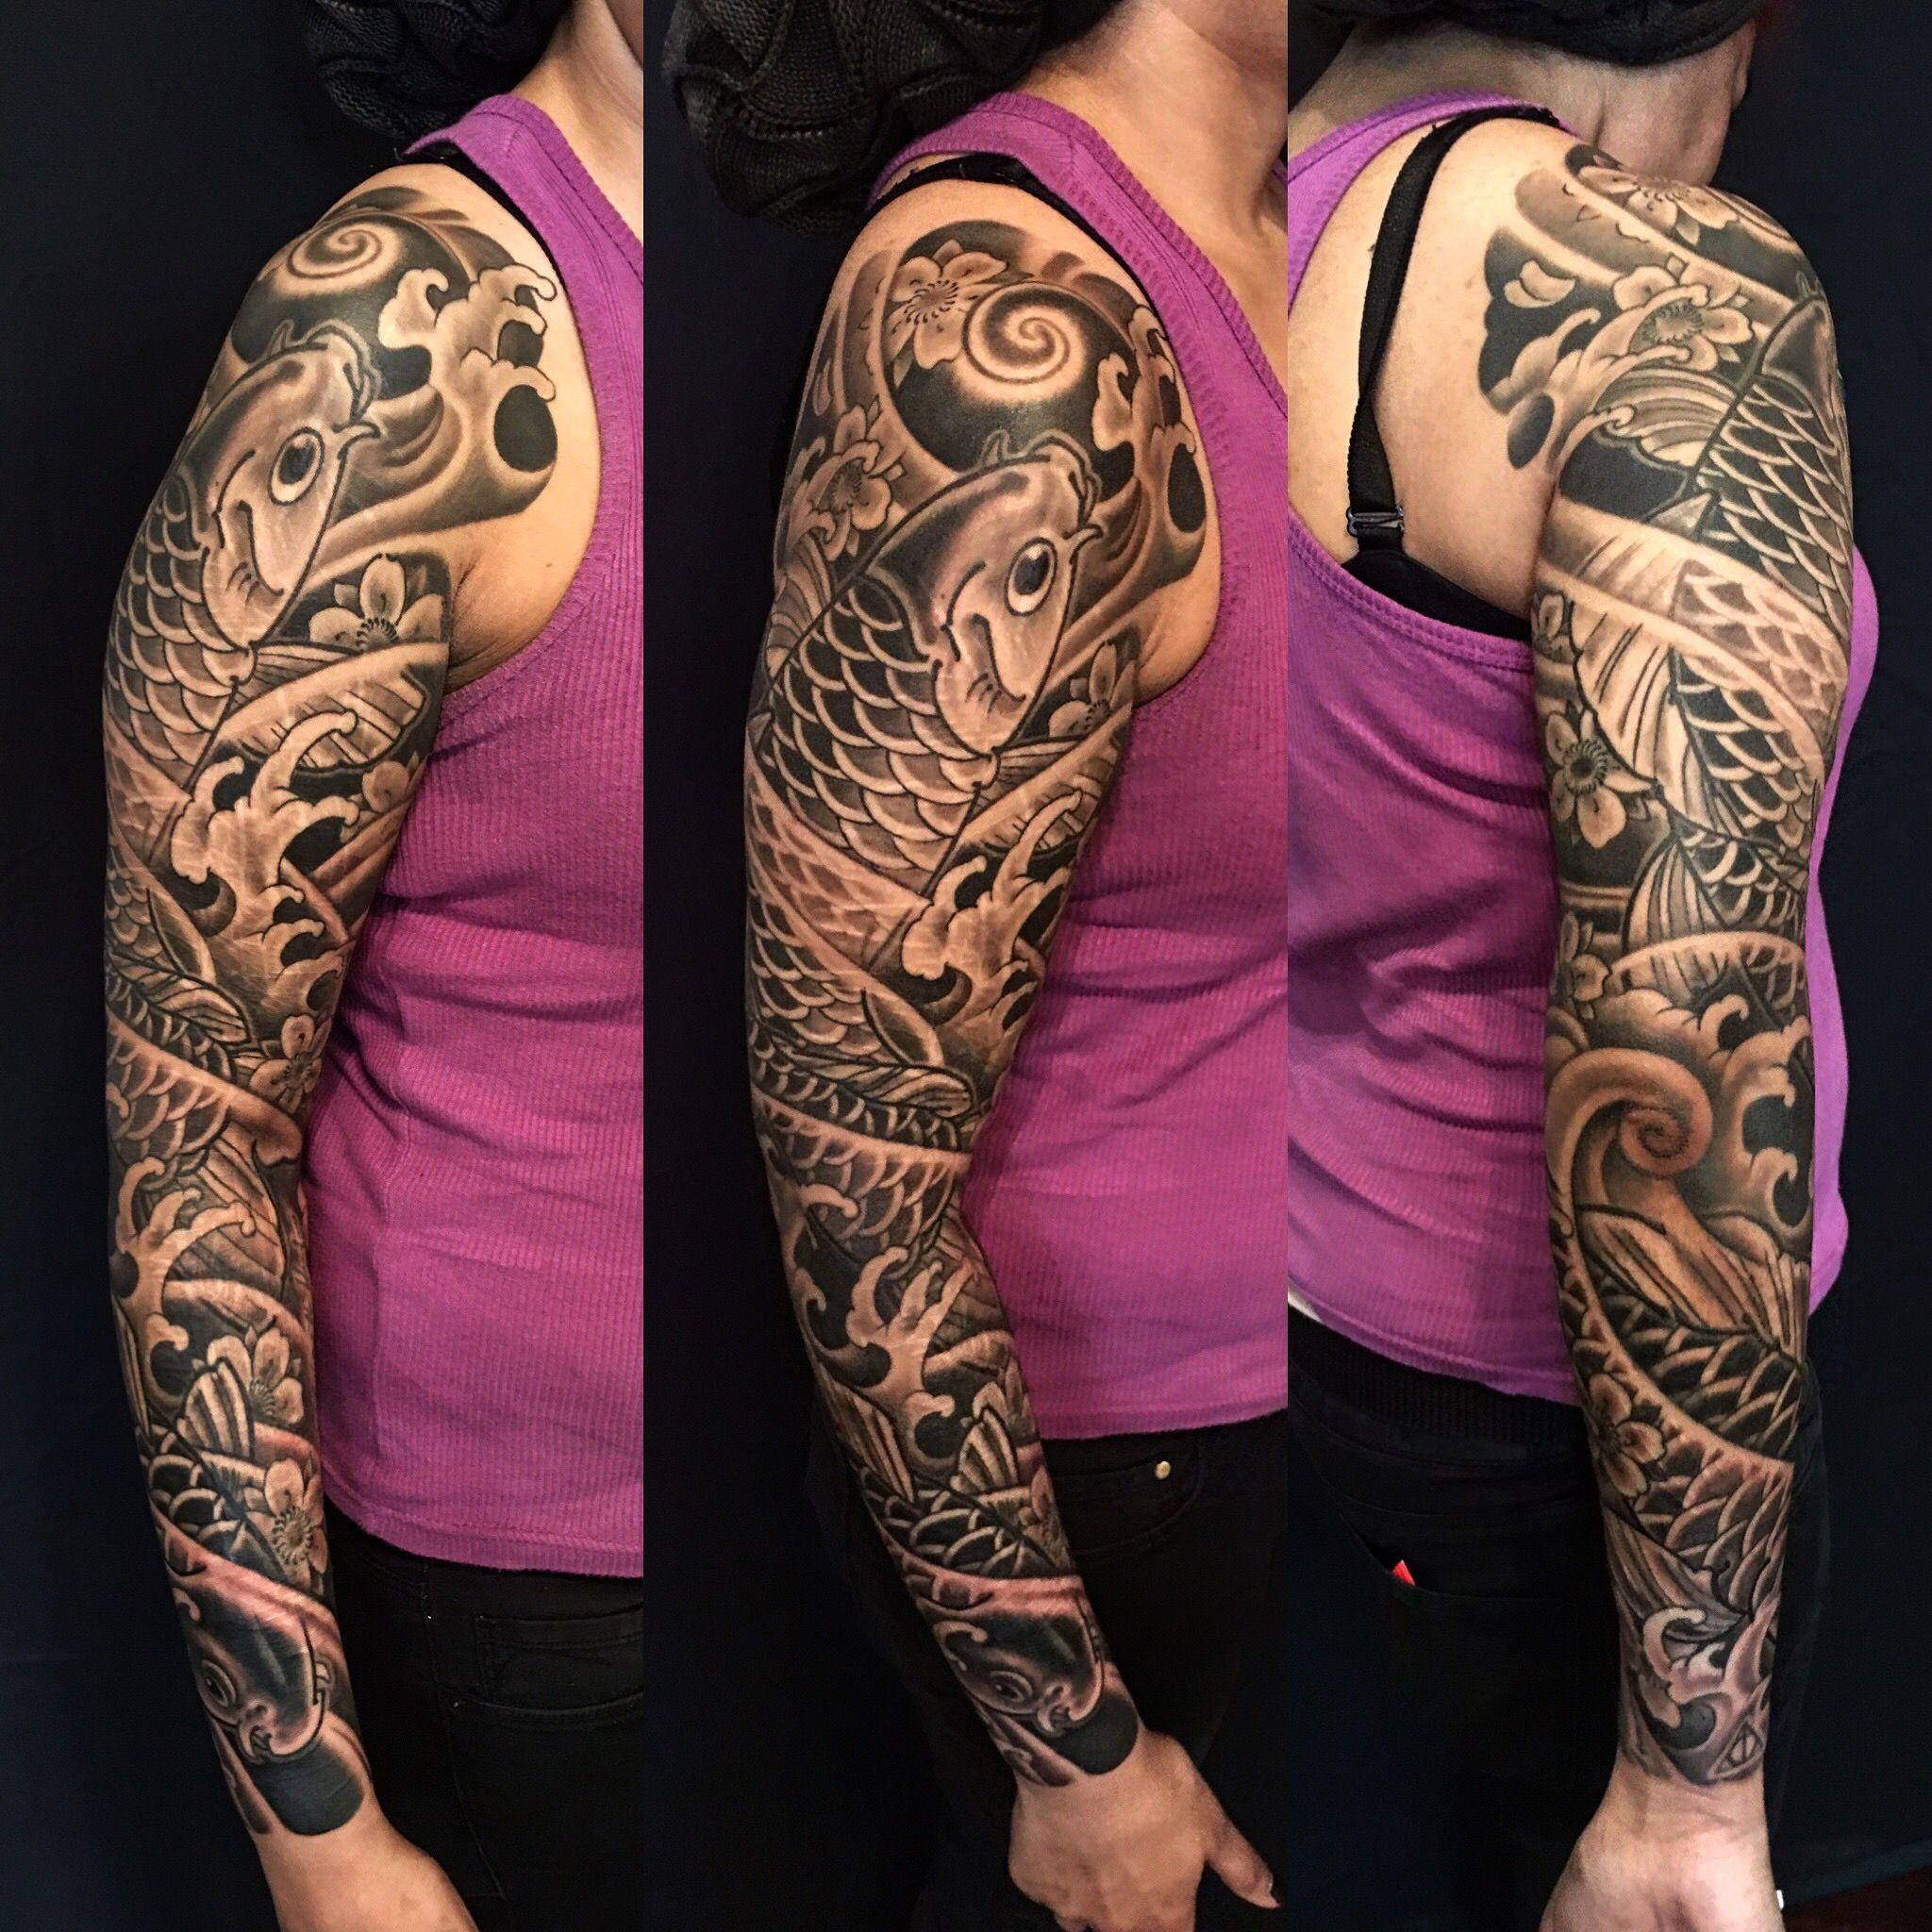 Japanese Full Sleeve Tattoo Black And Grey Sleeve Japanese Tattoo Koi Tattoo Scar Cover Up Full Sleeve Tattoos Sleeve Tattoos Best Sleeve Tattoos